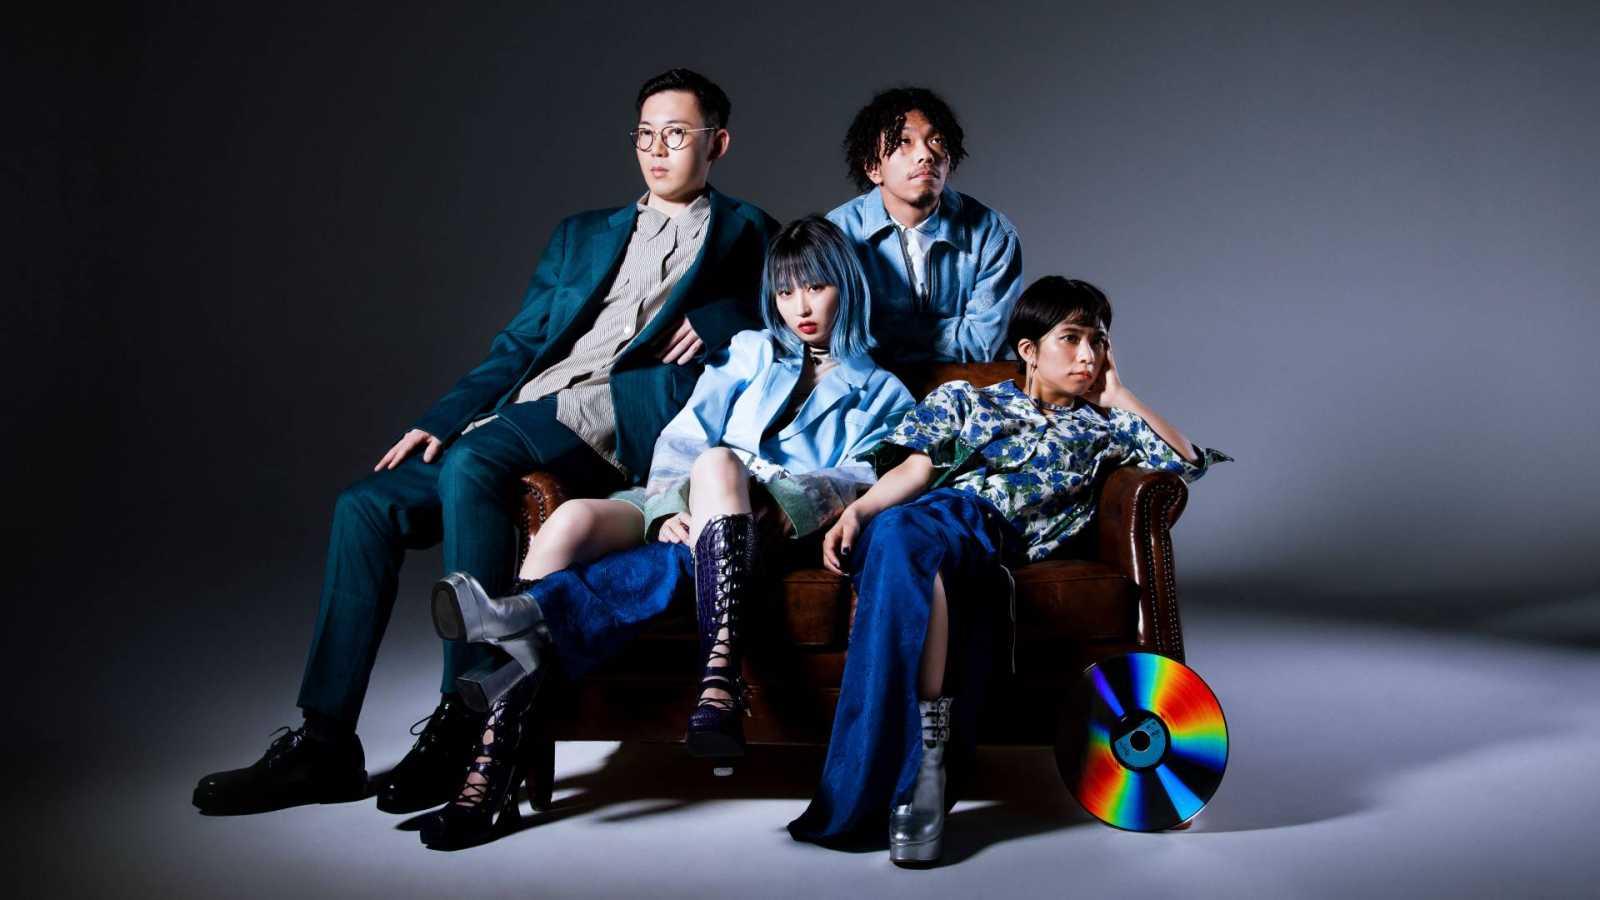 Awesome City Club lanzó un nuevo álbum © RENI Co.,Ltd. All rights reserved.